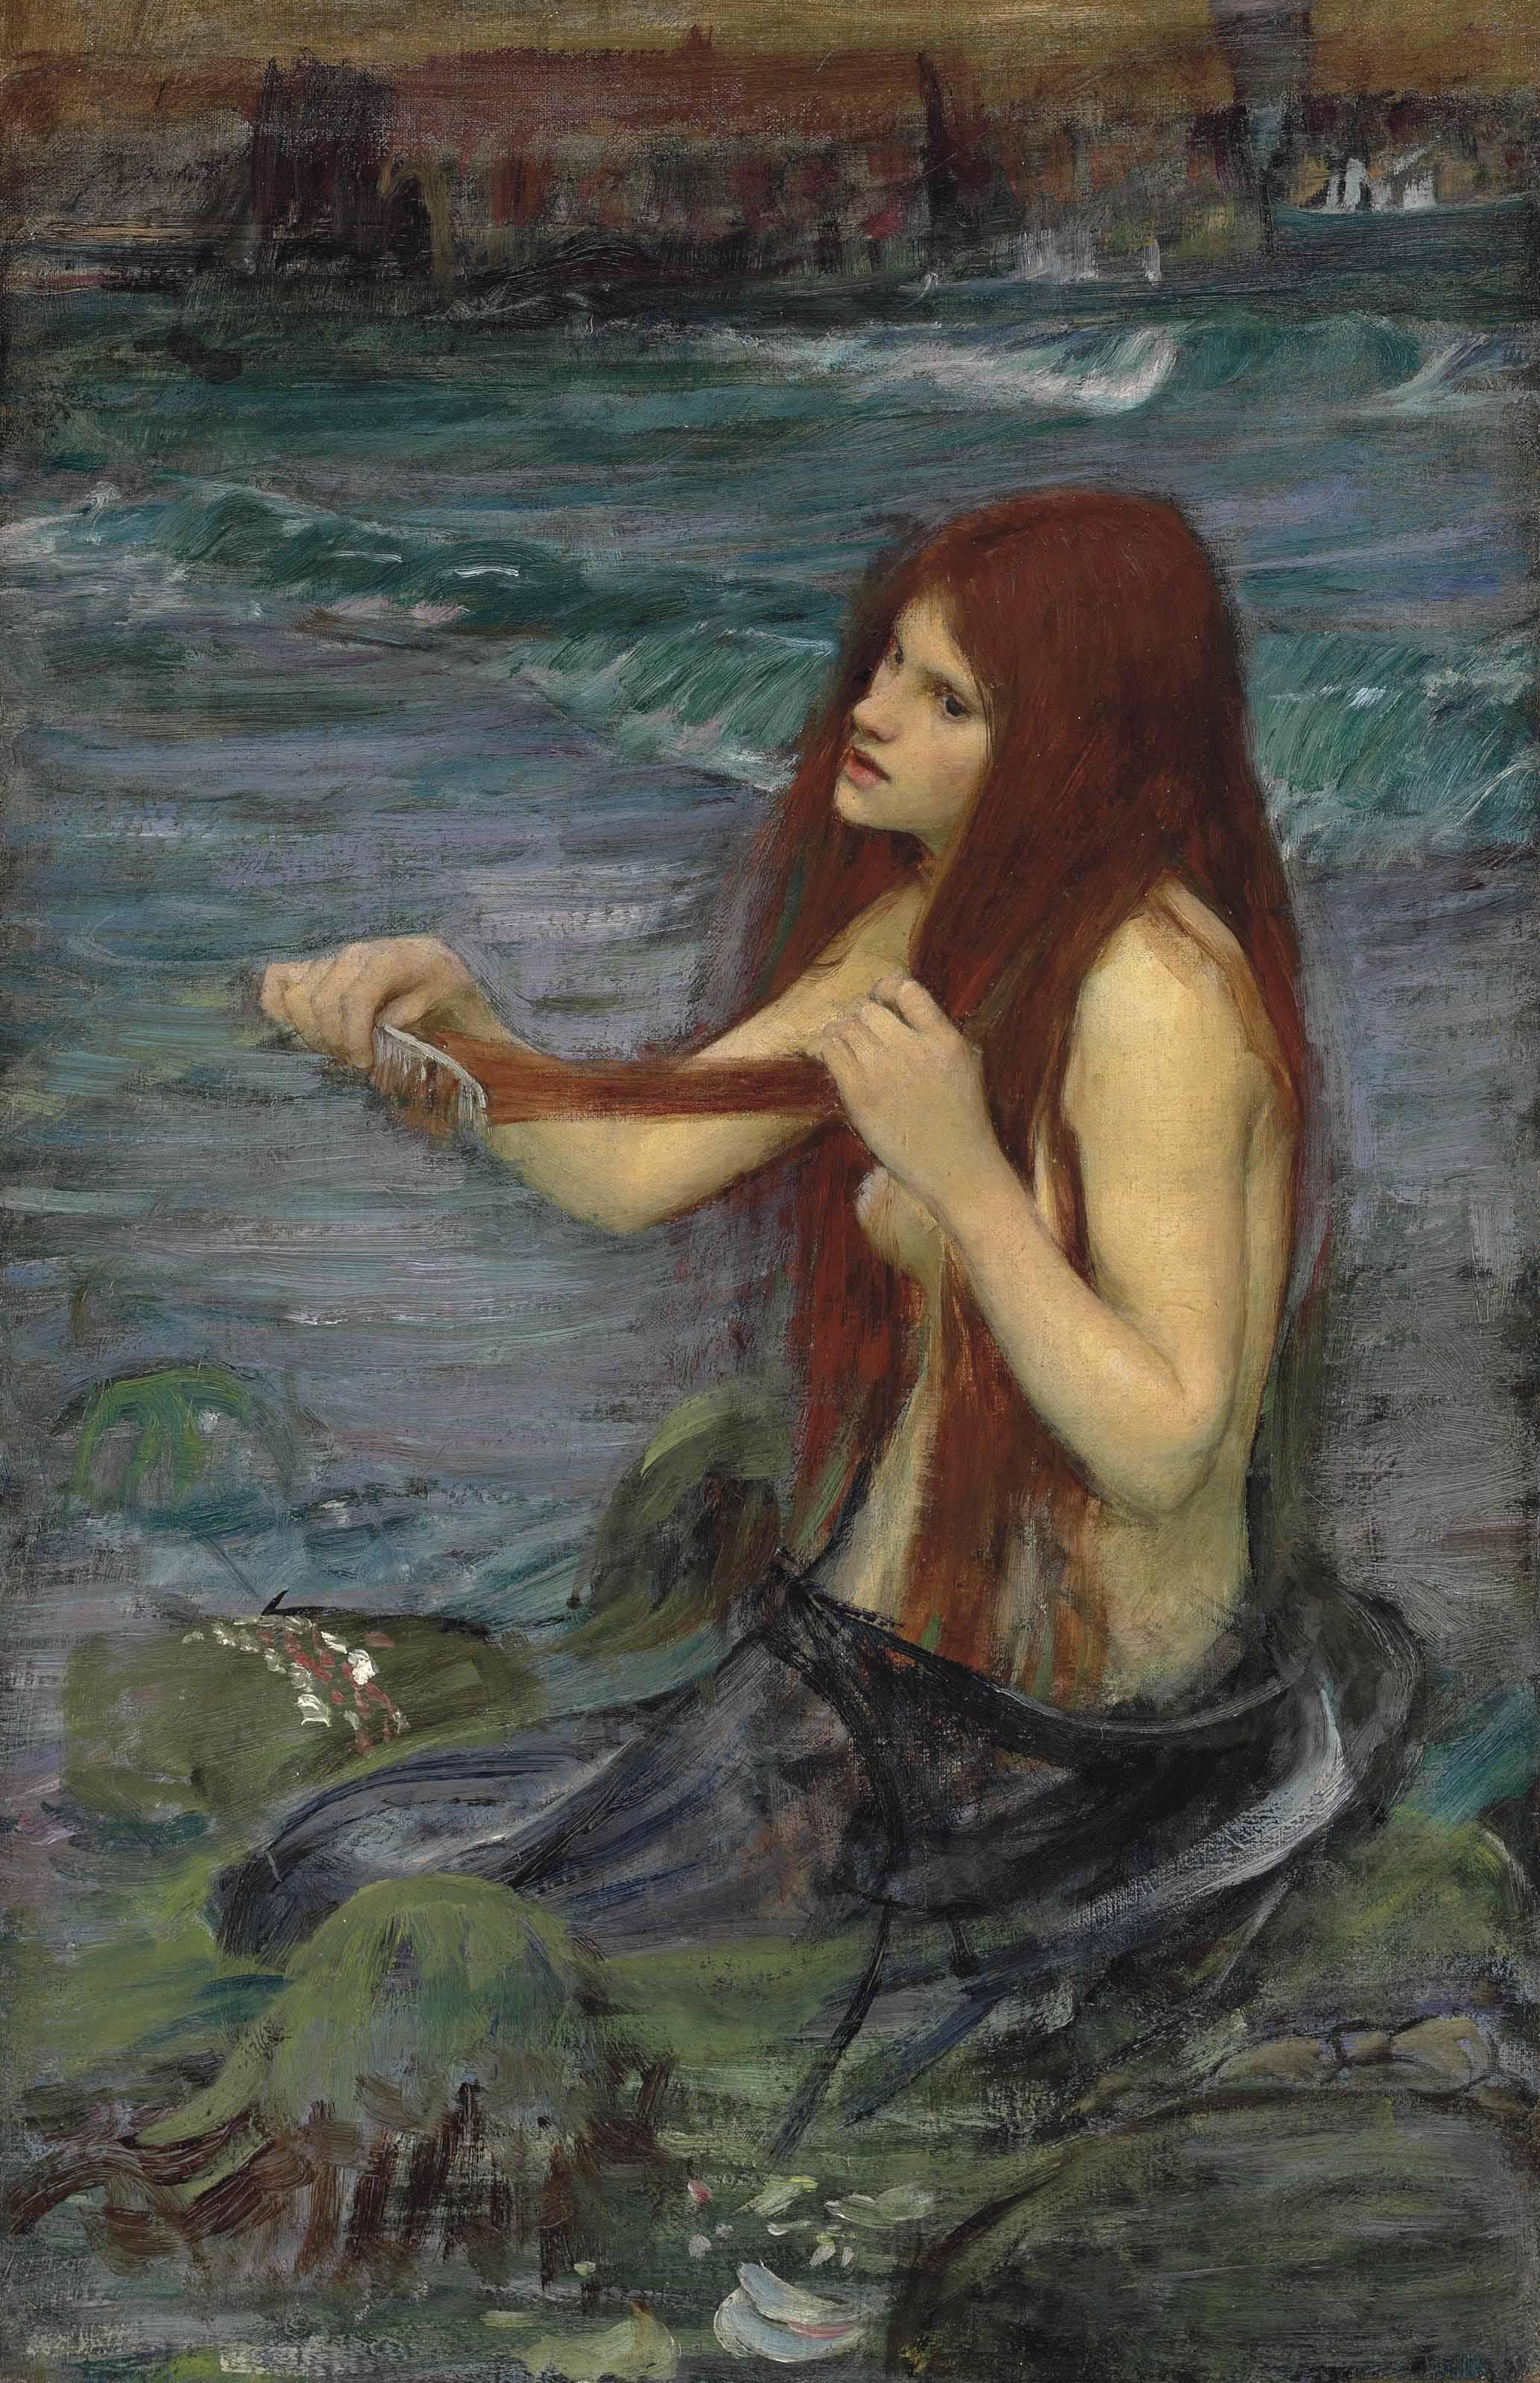 Sketch for 'A Mermaid'